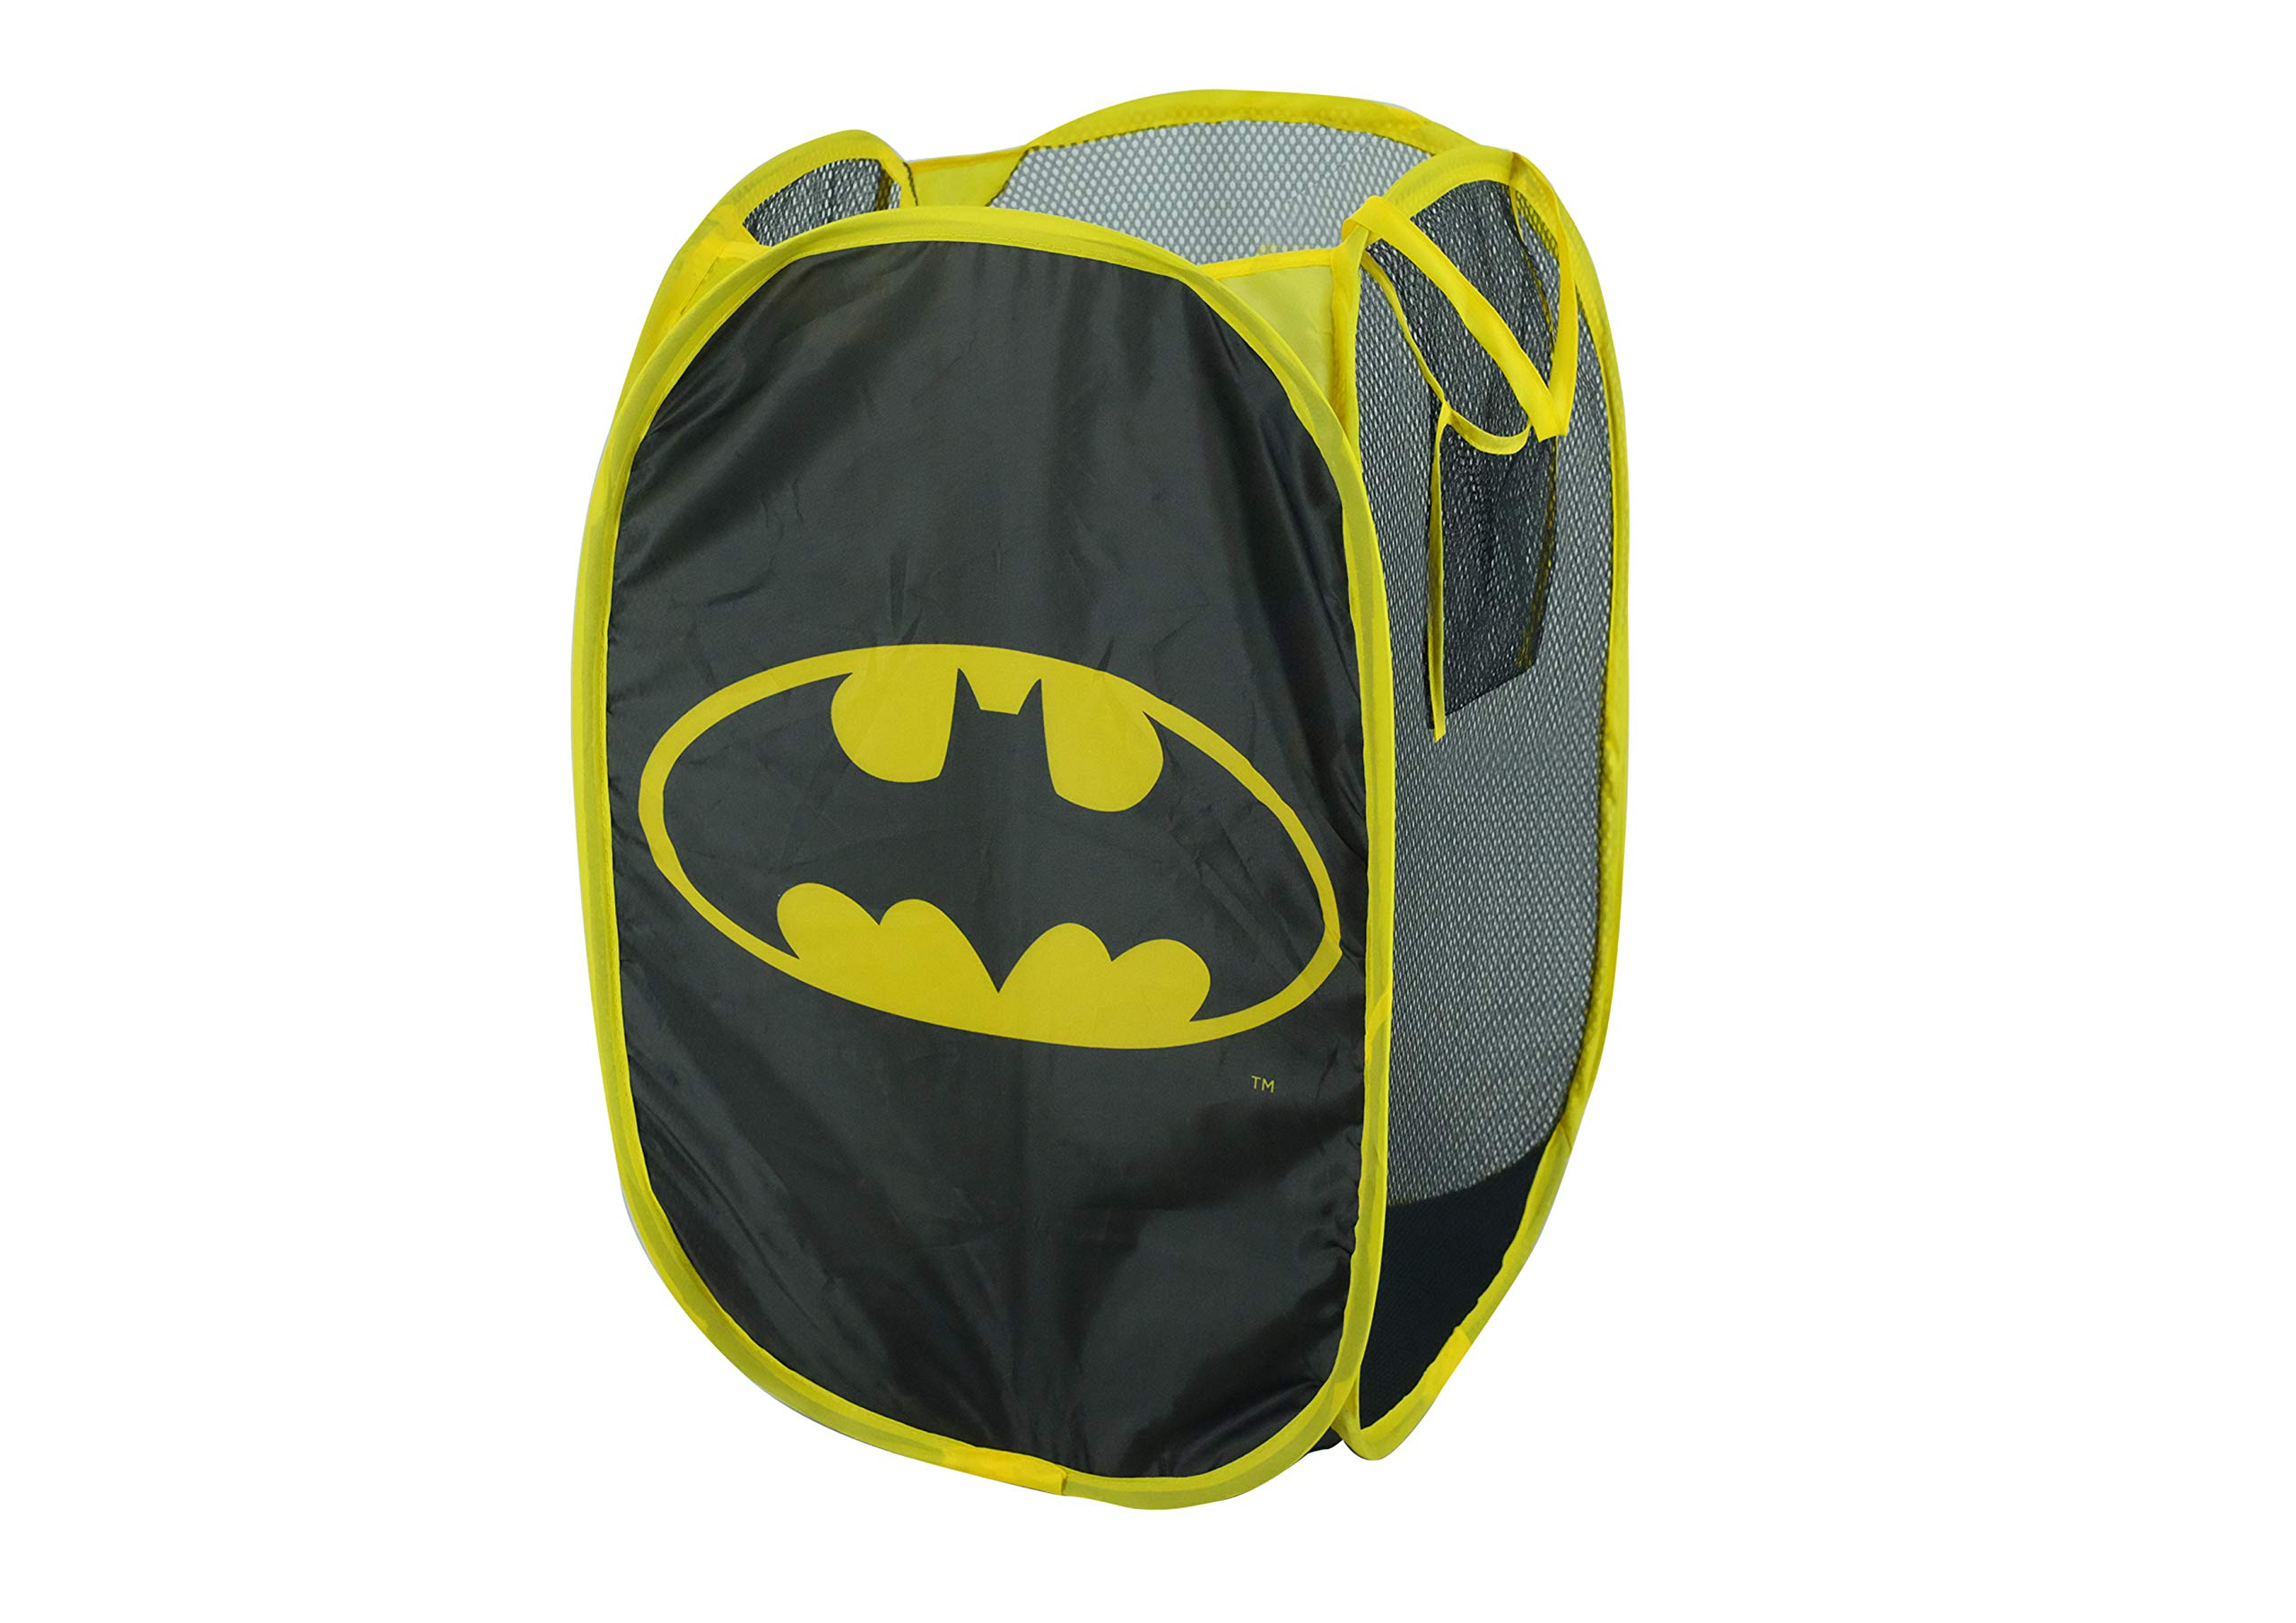 Batman Pop Up Laundry Bin, Black by Warner Bros